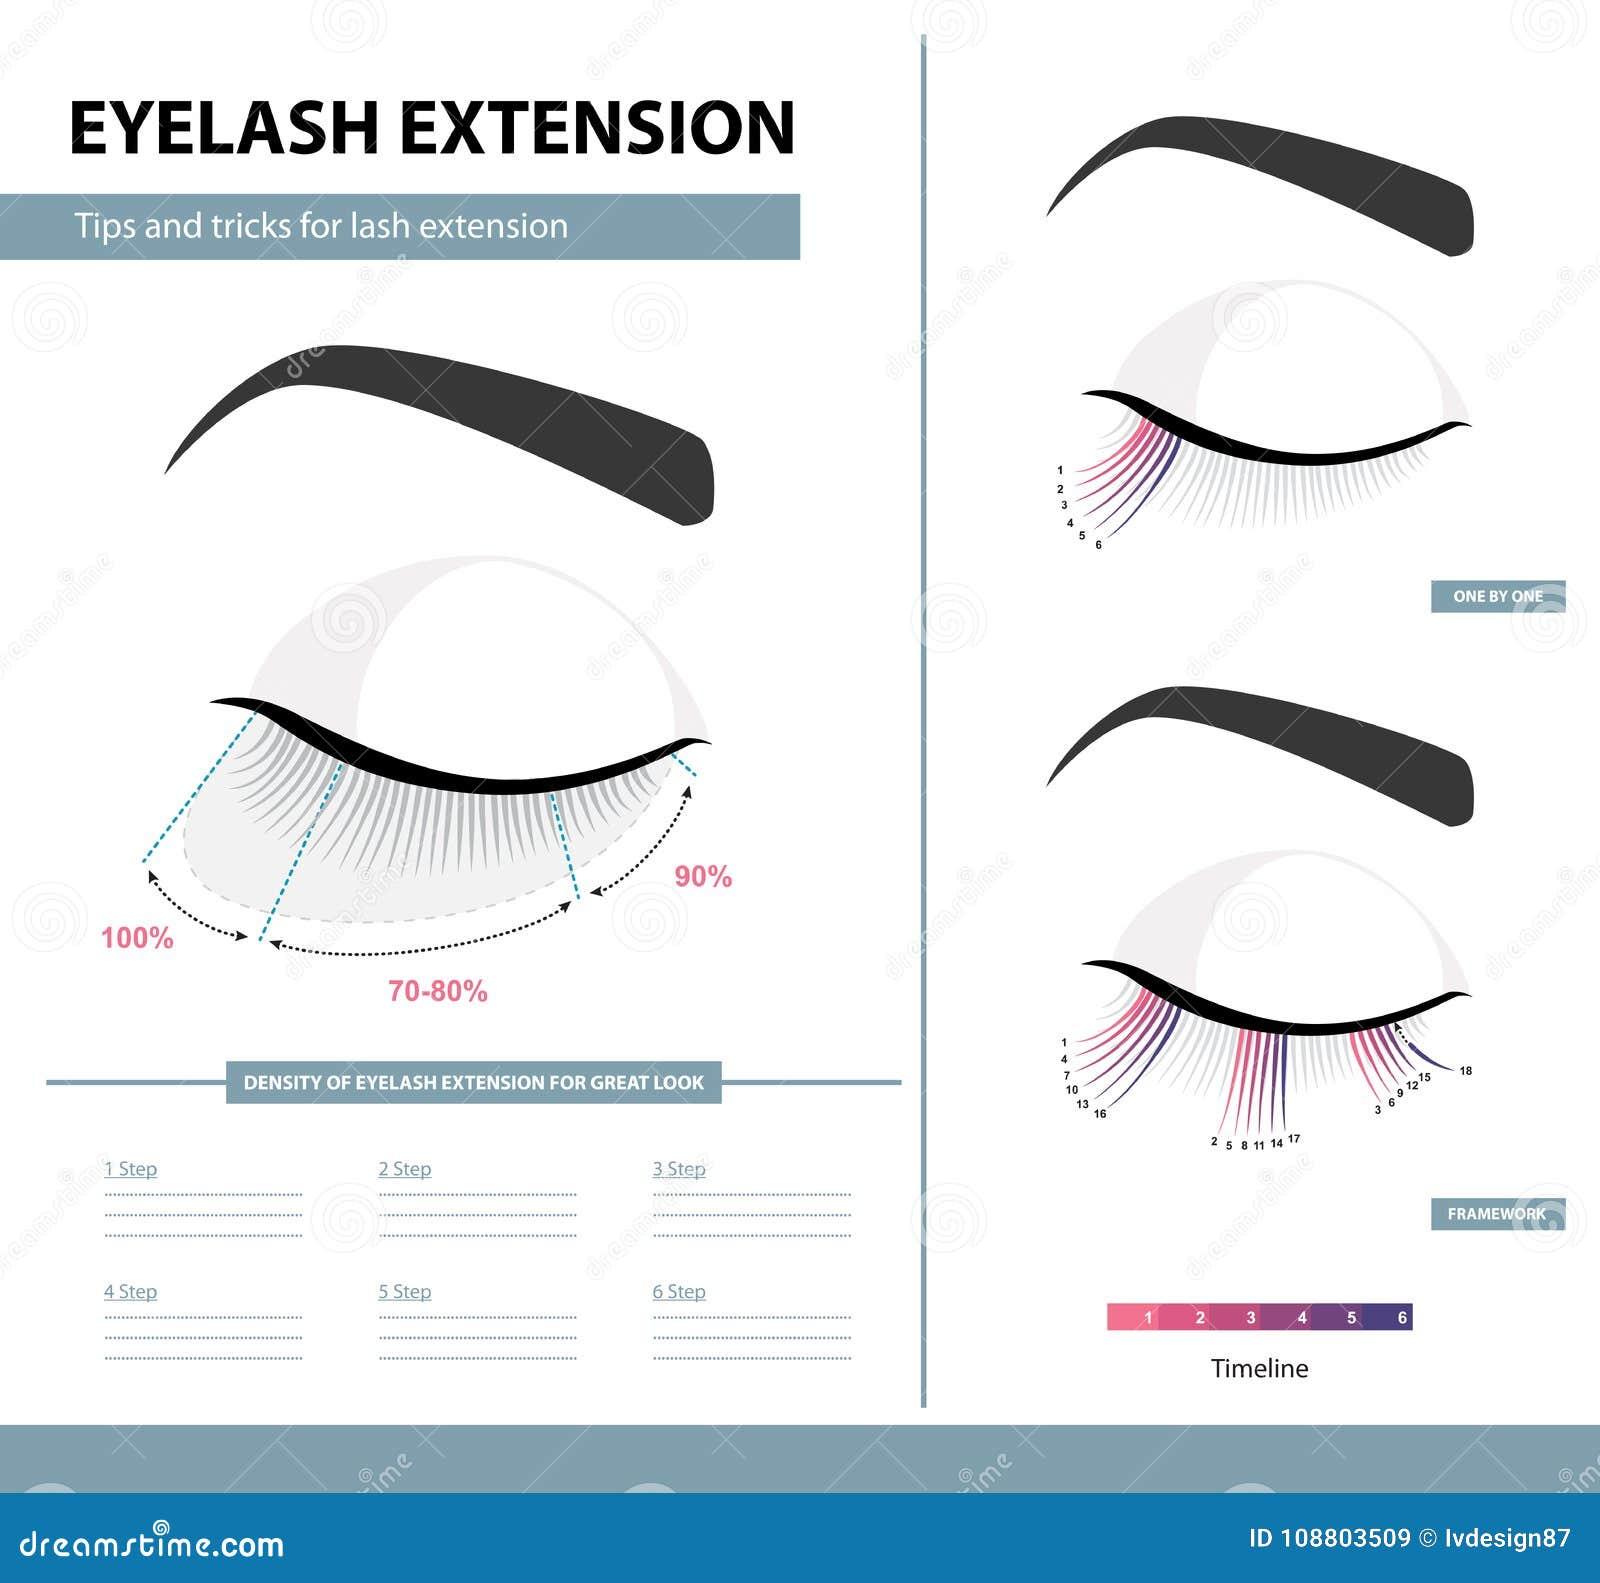 Eyelash Extension Guide Density Of Eyelash Extension For Great Look